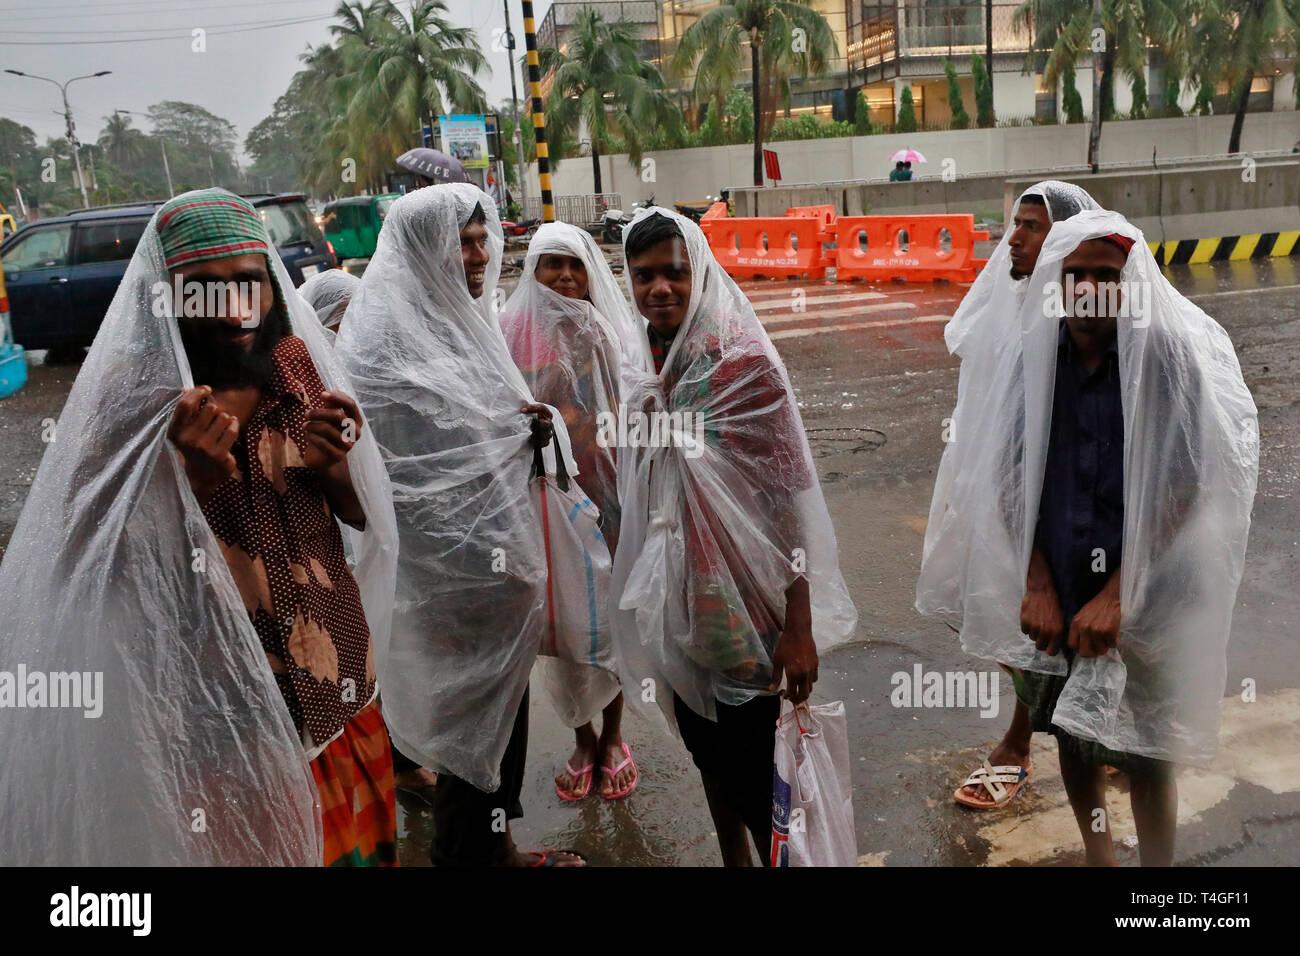 Dhaka Bus Stock Photos & Dhaka Bus Stock Images - Alamy